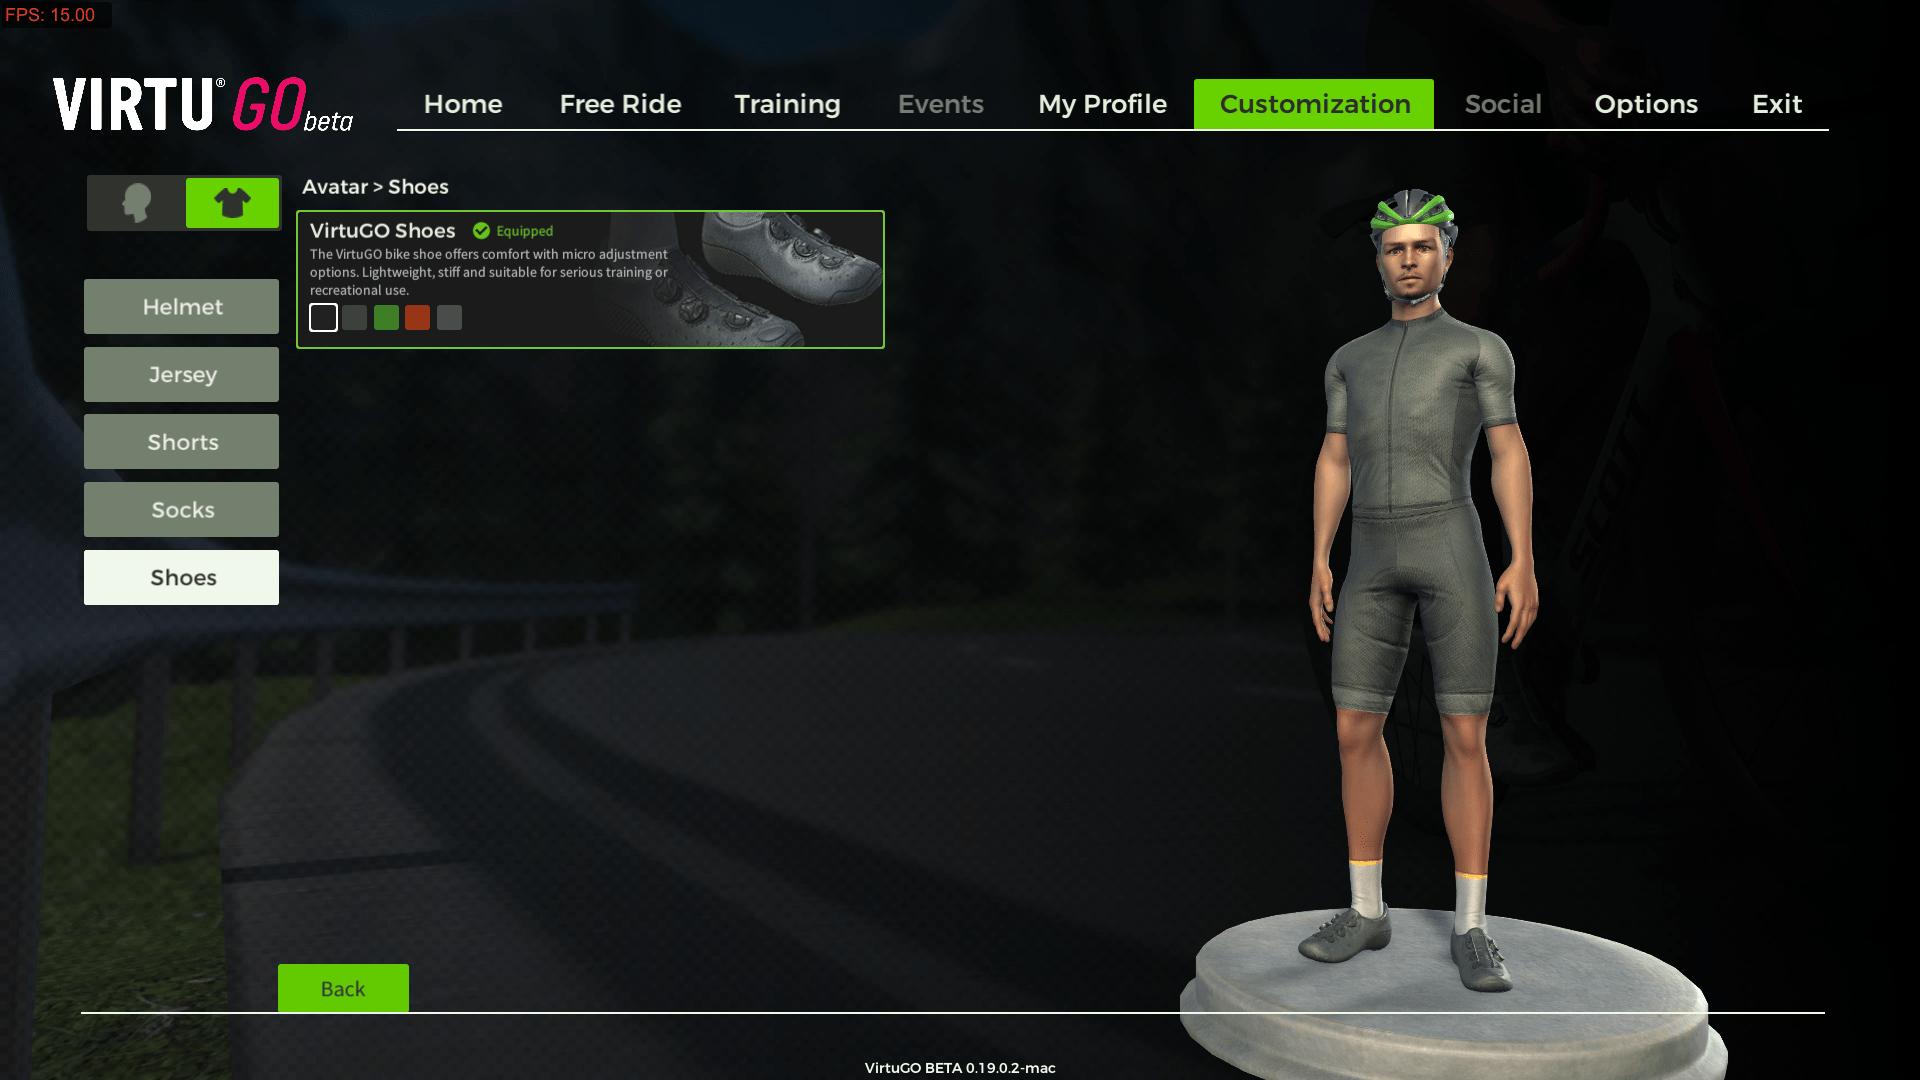 My look in the VirtuGO platform